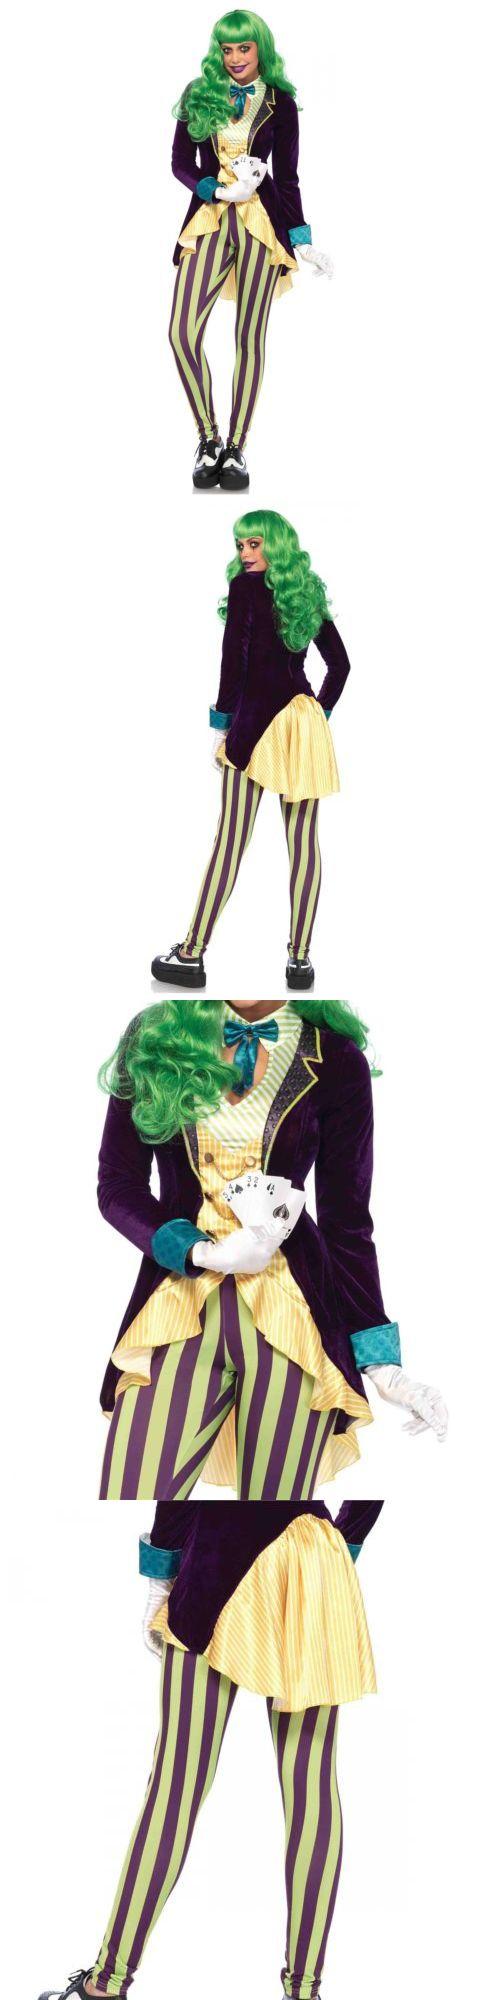 Halloween Costumes Women: Female Joker Costume Adult Super Villain Girl Halloween Fancy Dress -> BUY IT NOW ONLY: $57.95 on eBay!